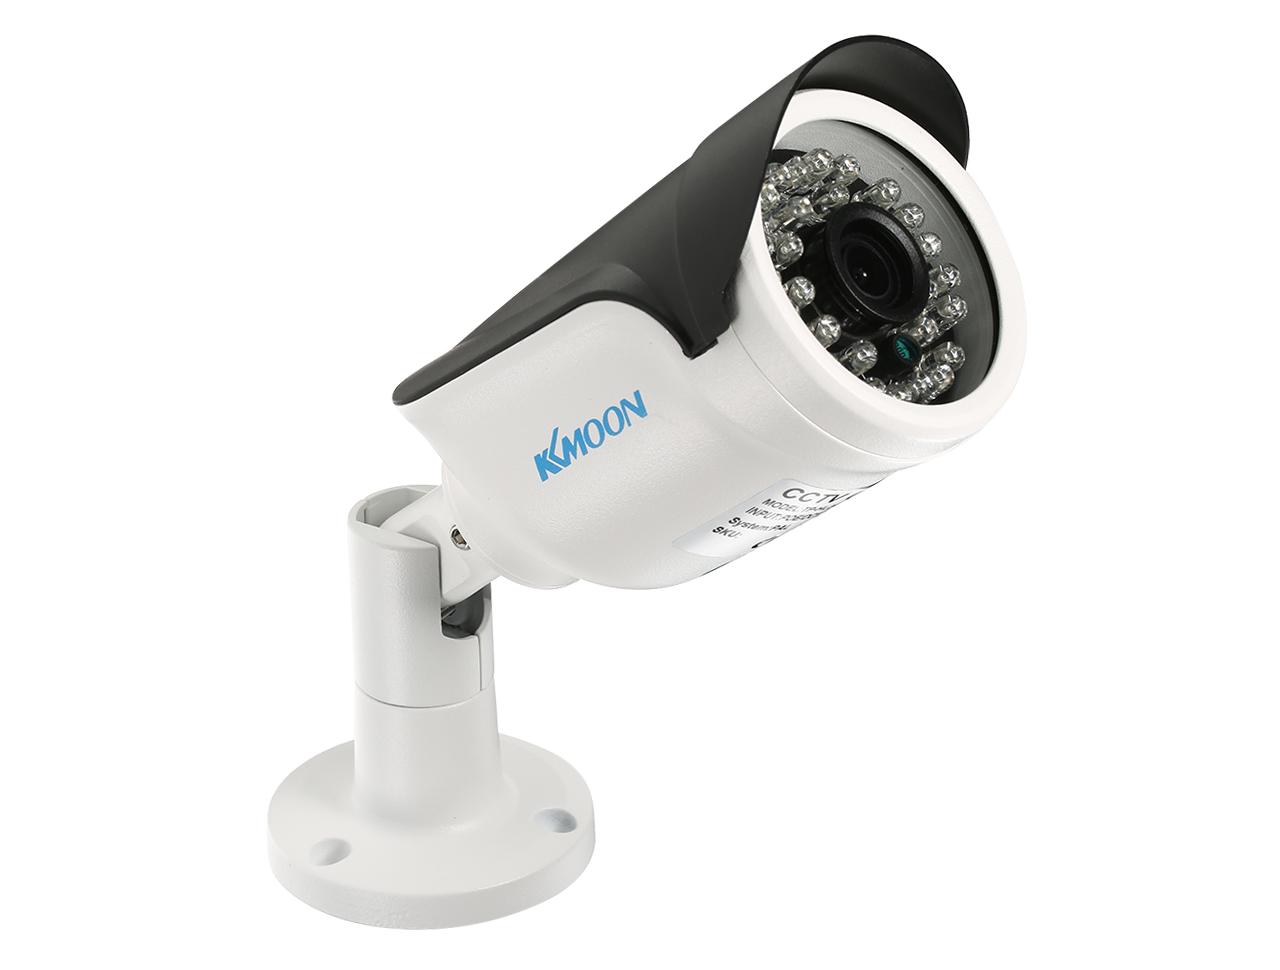 KKmoon 1080P HD P2P POE IP Camera